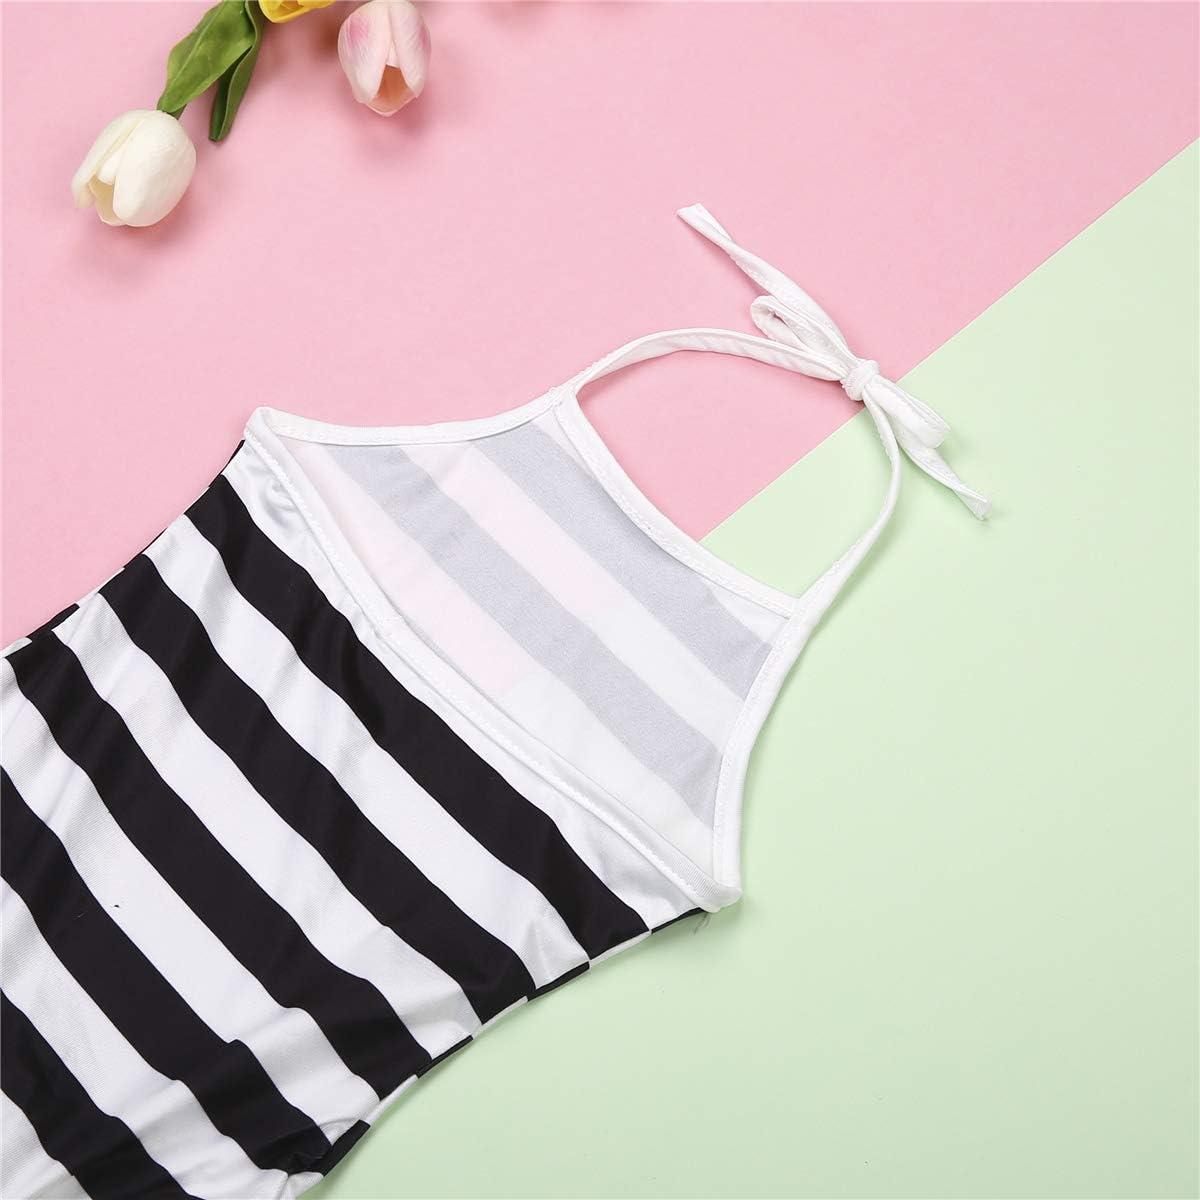 Mommy and Me Matching Swimsuit Mother Bikini Set Daughter One-Piece Strip Print Monokini Beach Wear